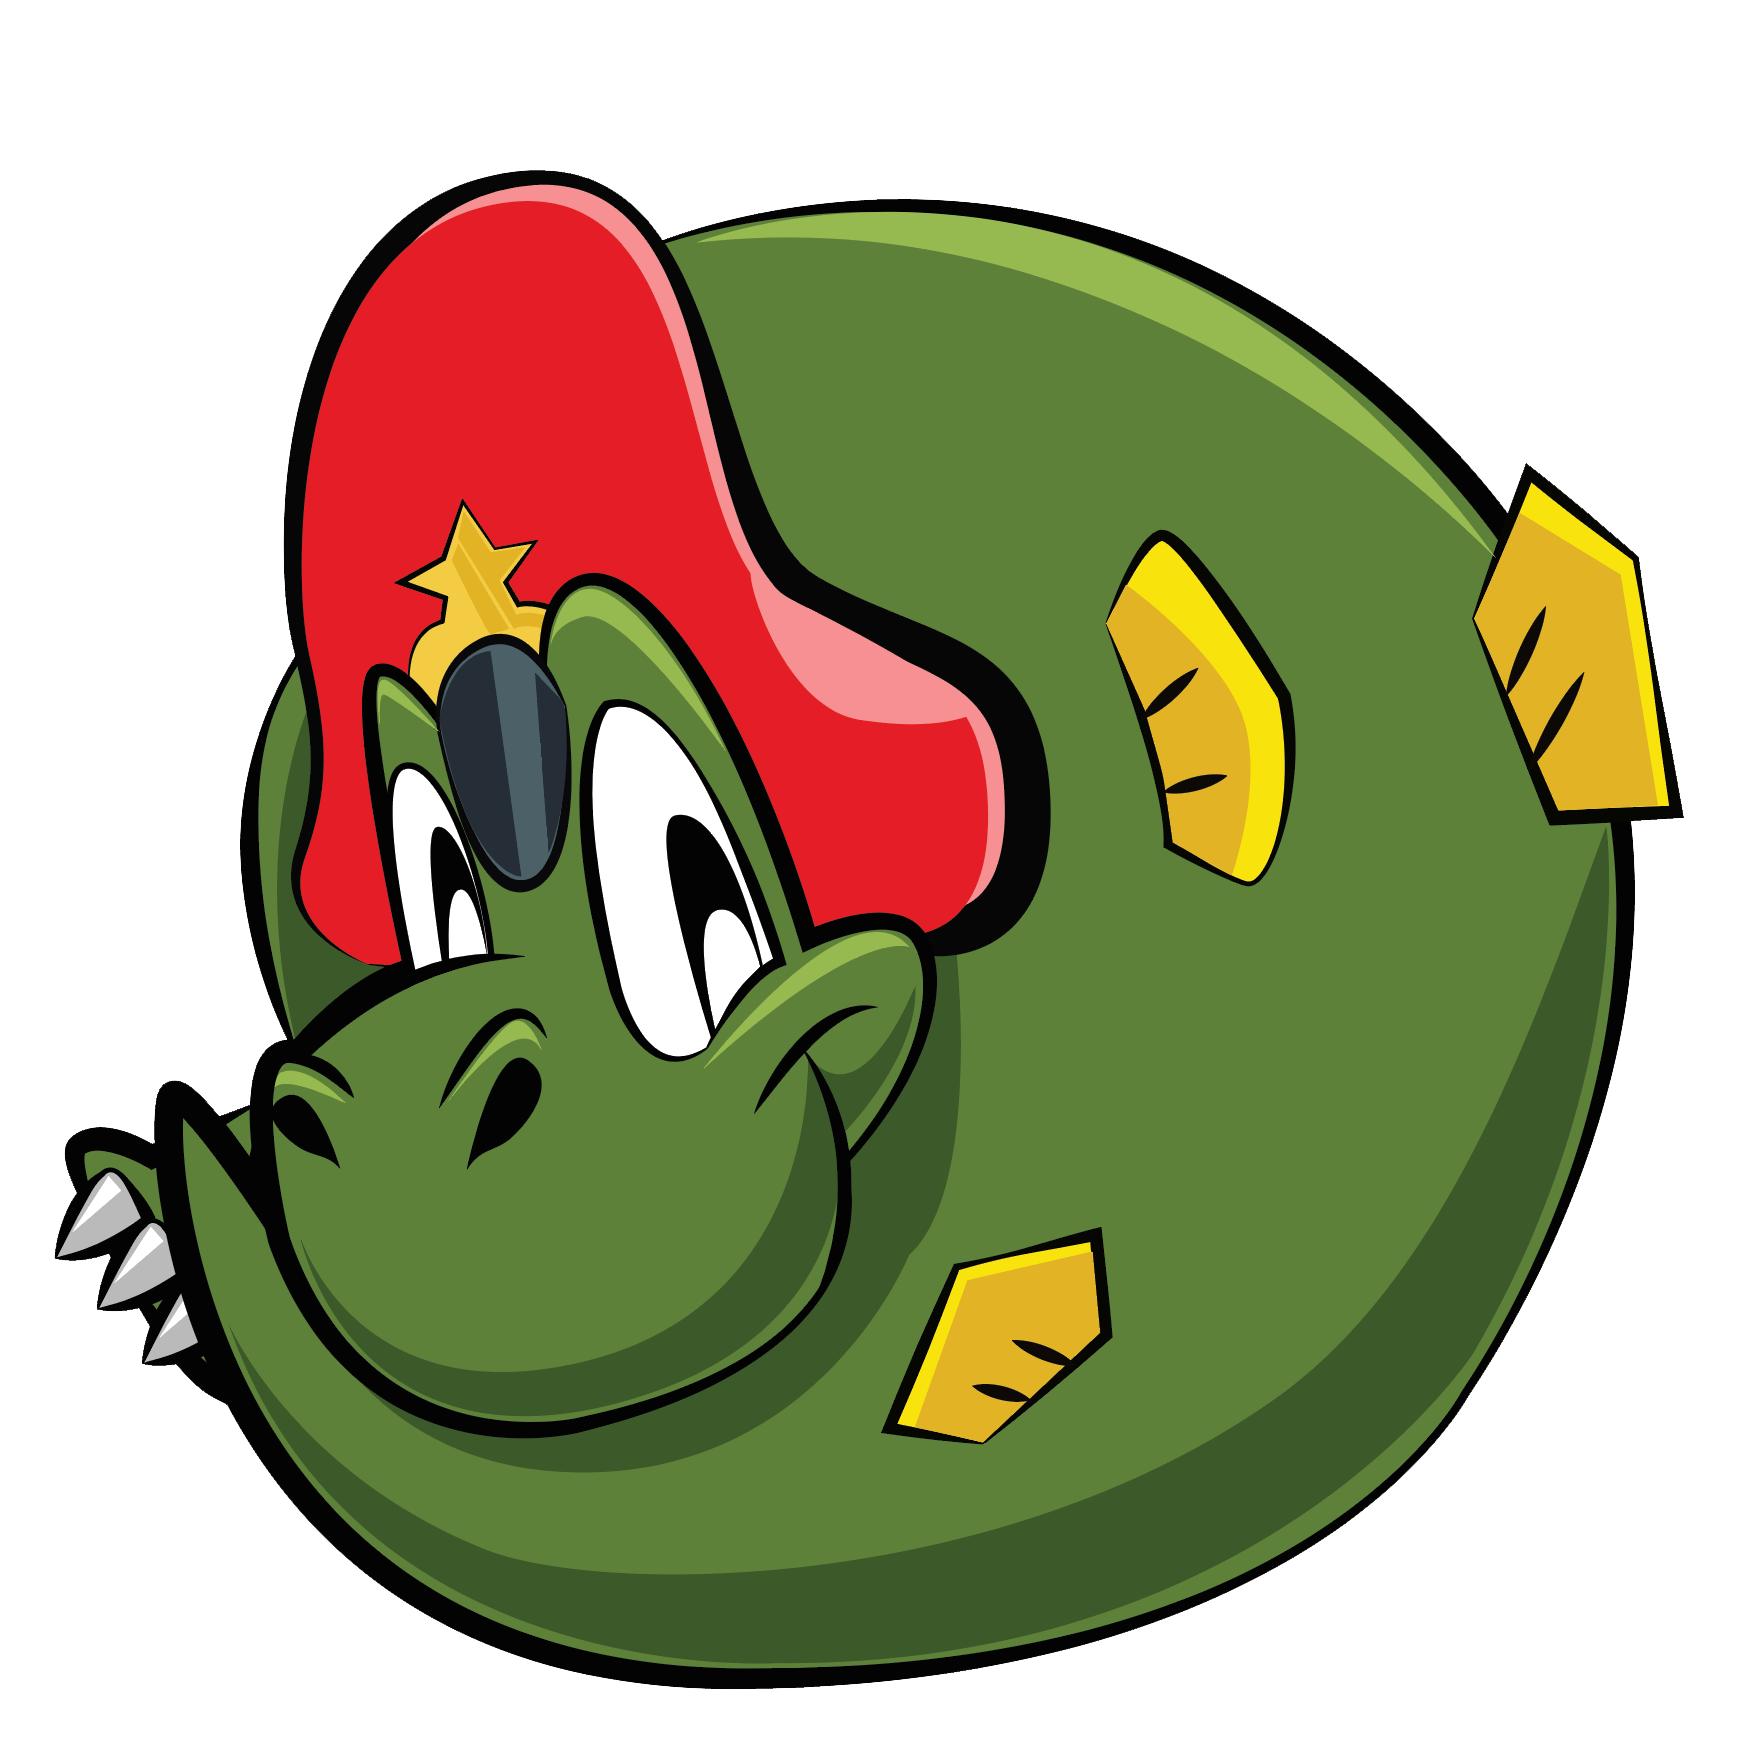 Spiffy - an adorable, peaked cap dinosaur mascot